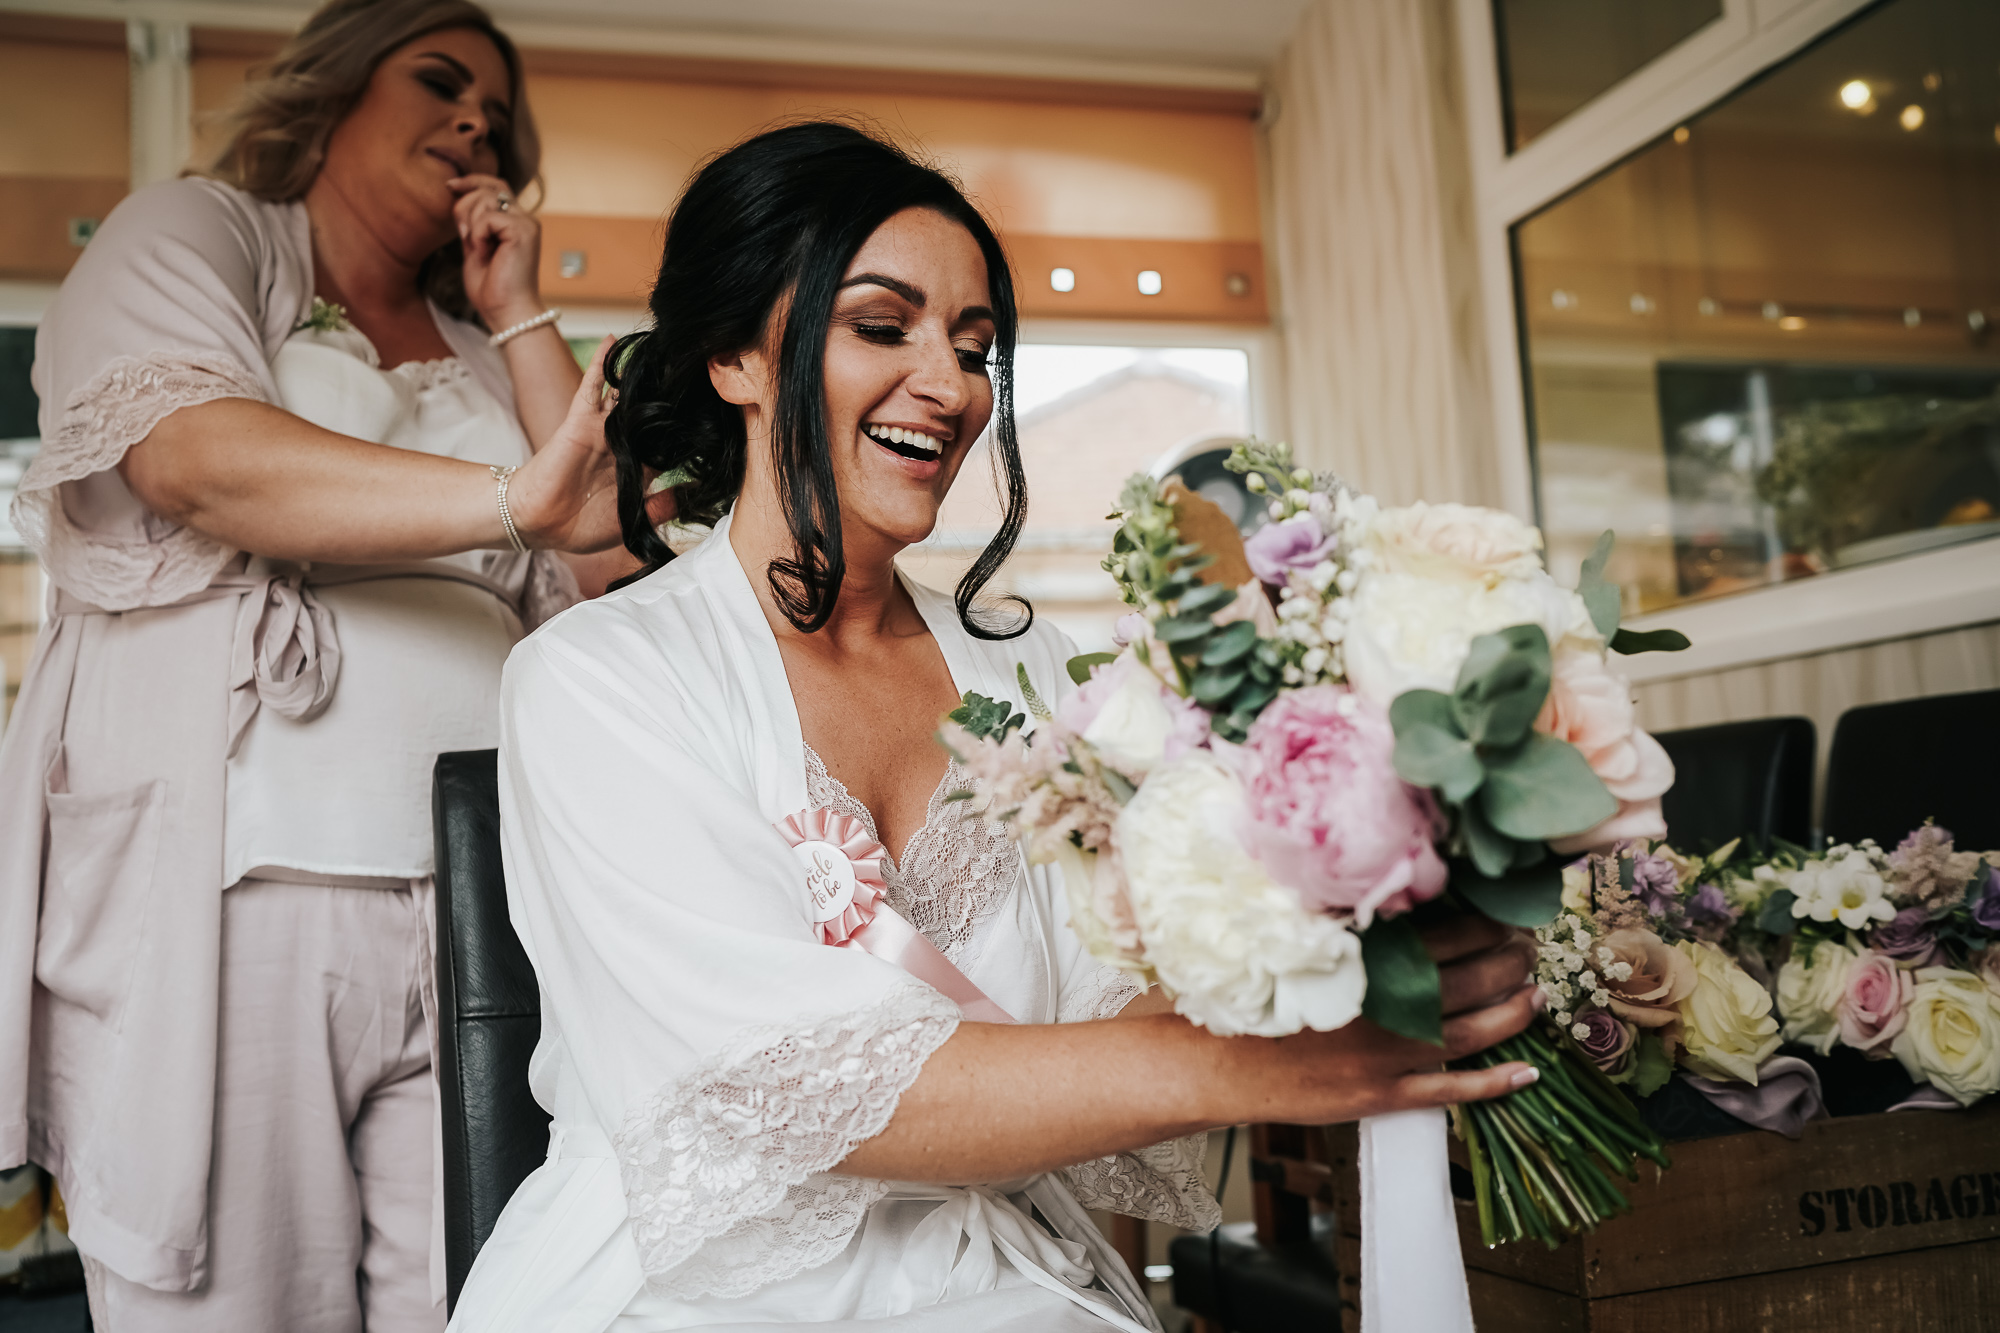 The Hayloft Wedding Photography Cheshire wedding photographer (8 of 52).jpg